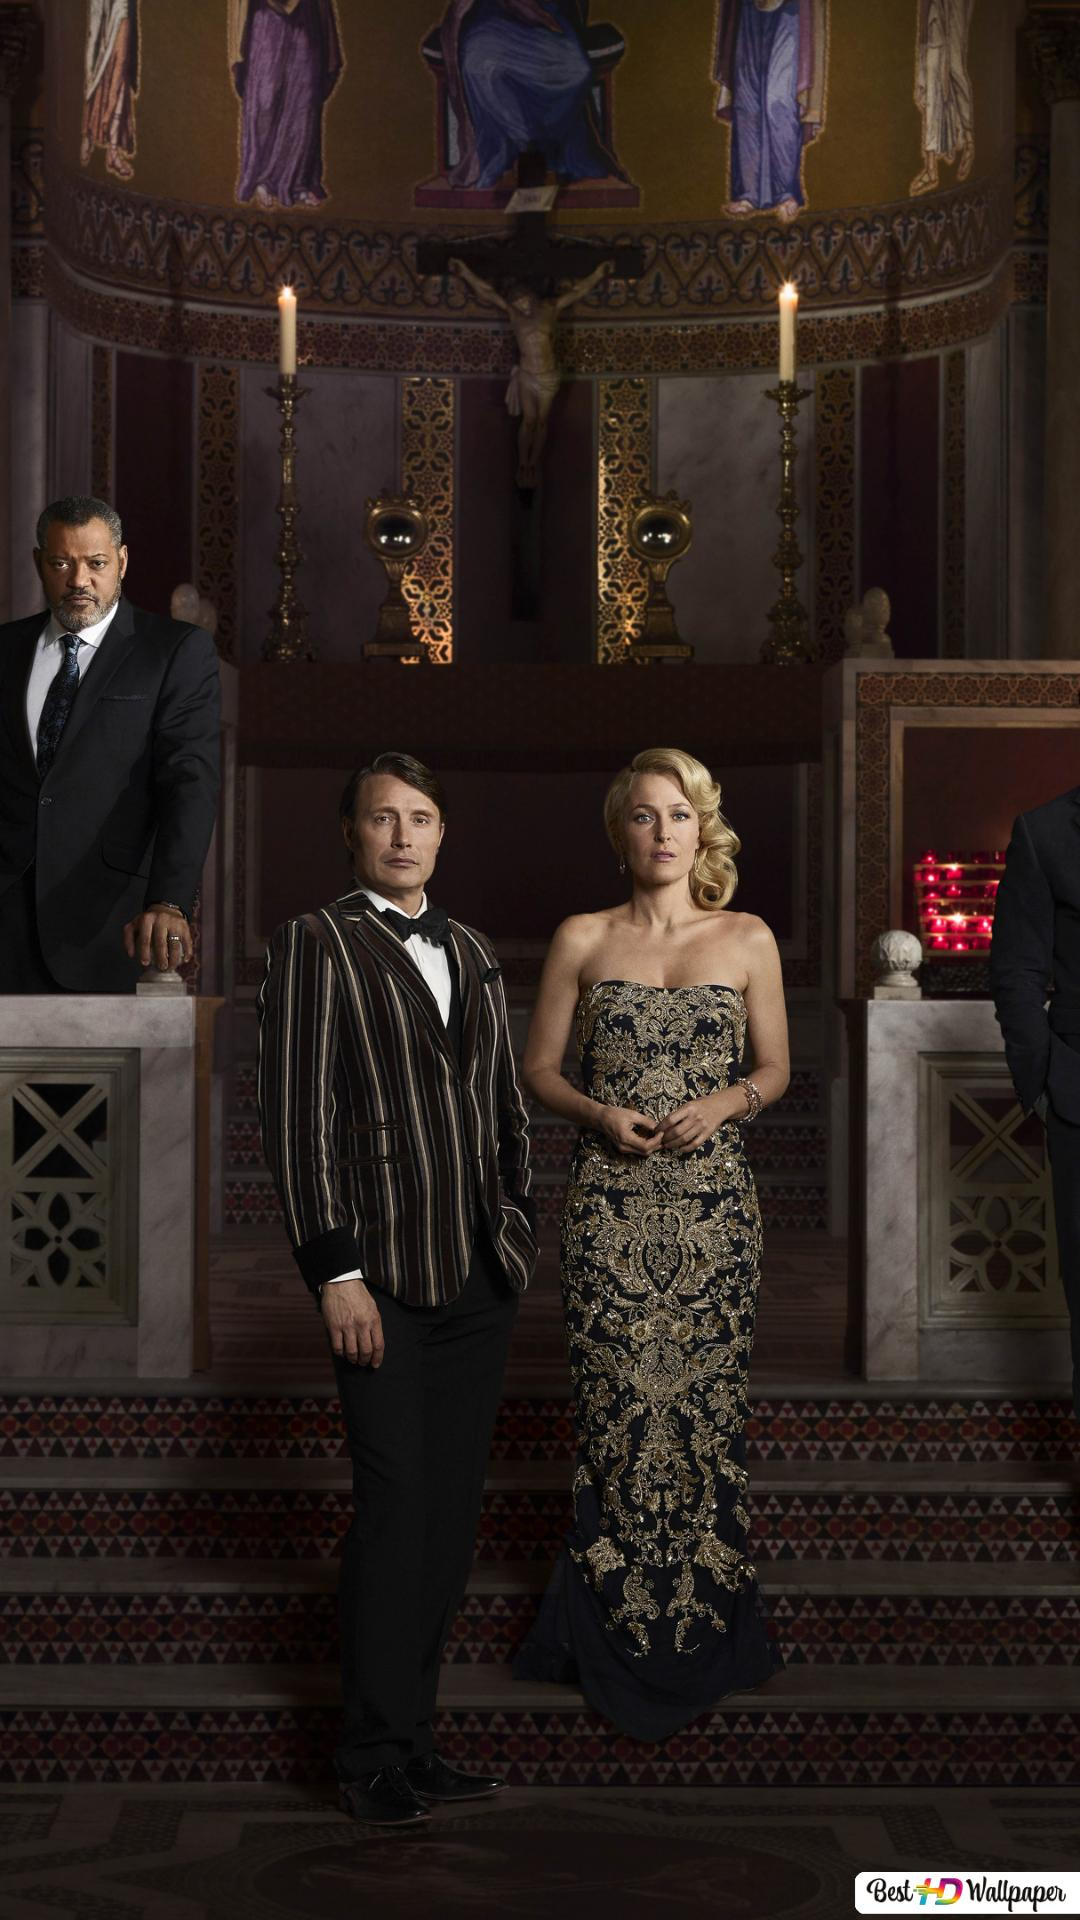 The Cast of Hannibal HD wallpaper download